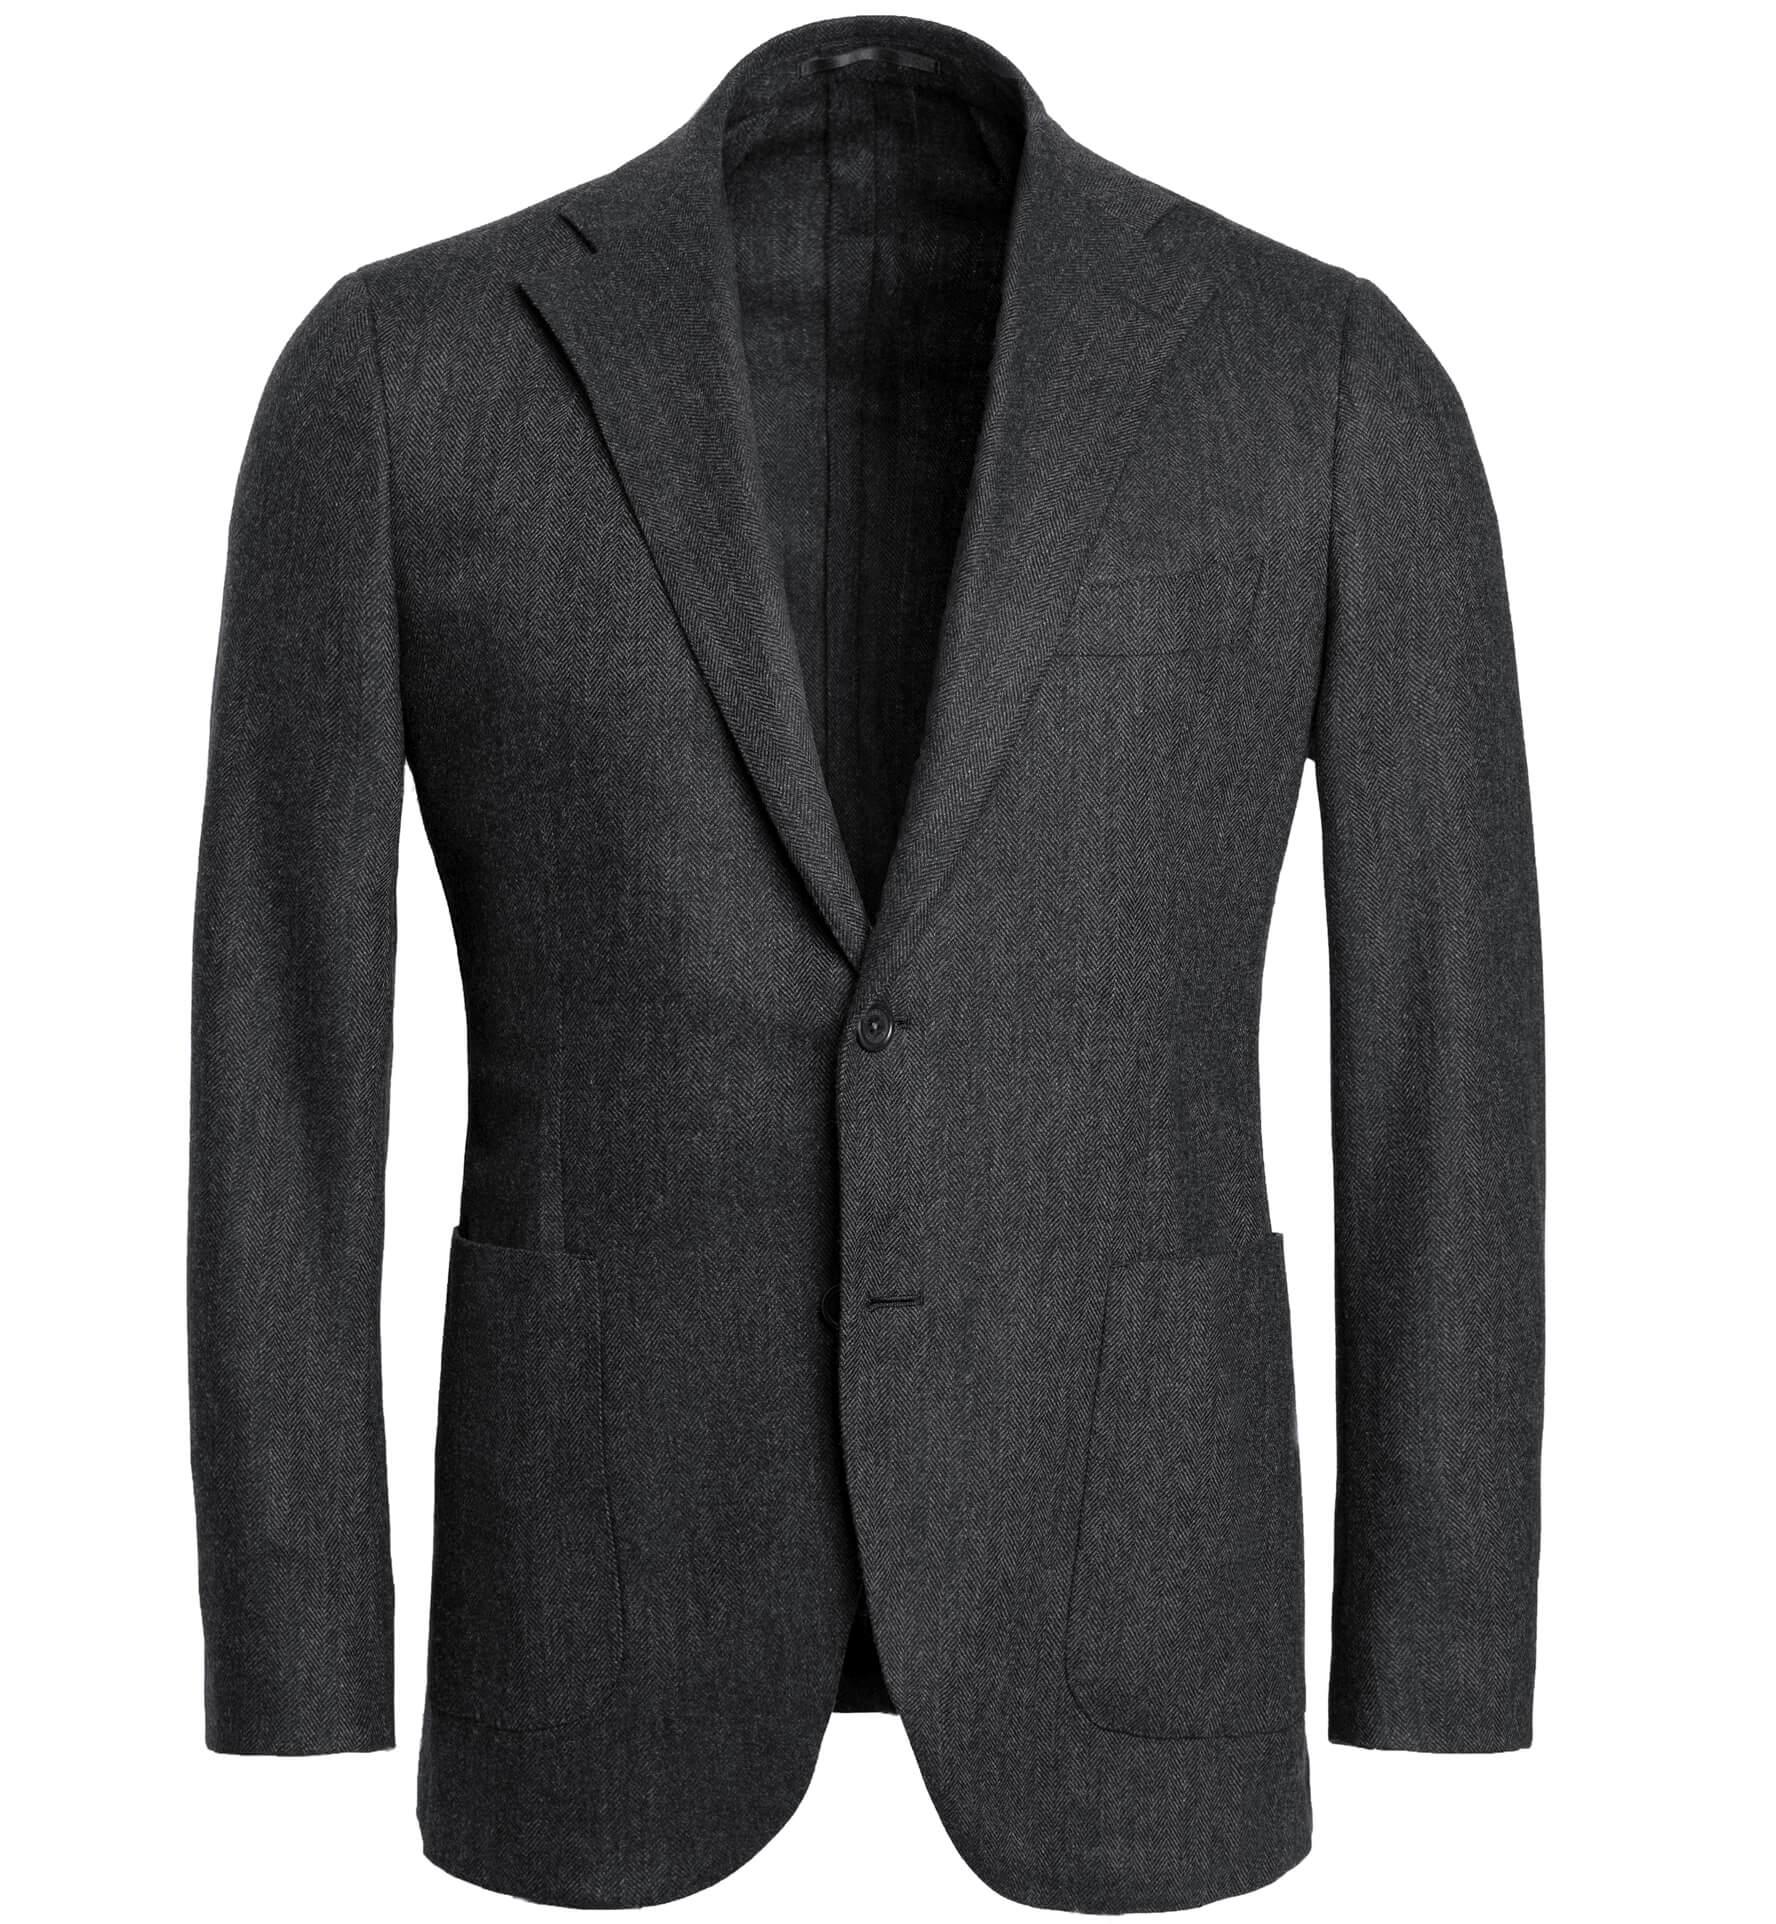 Zoom Image of Waverly Grey Herringbone Flannel Unstructured Jacket